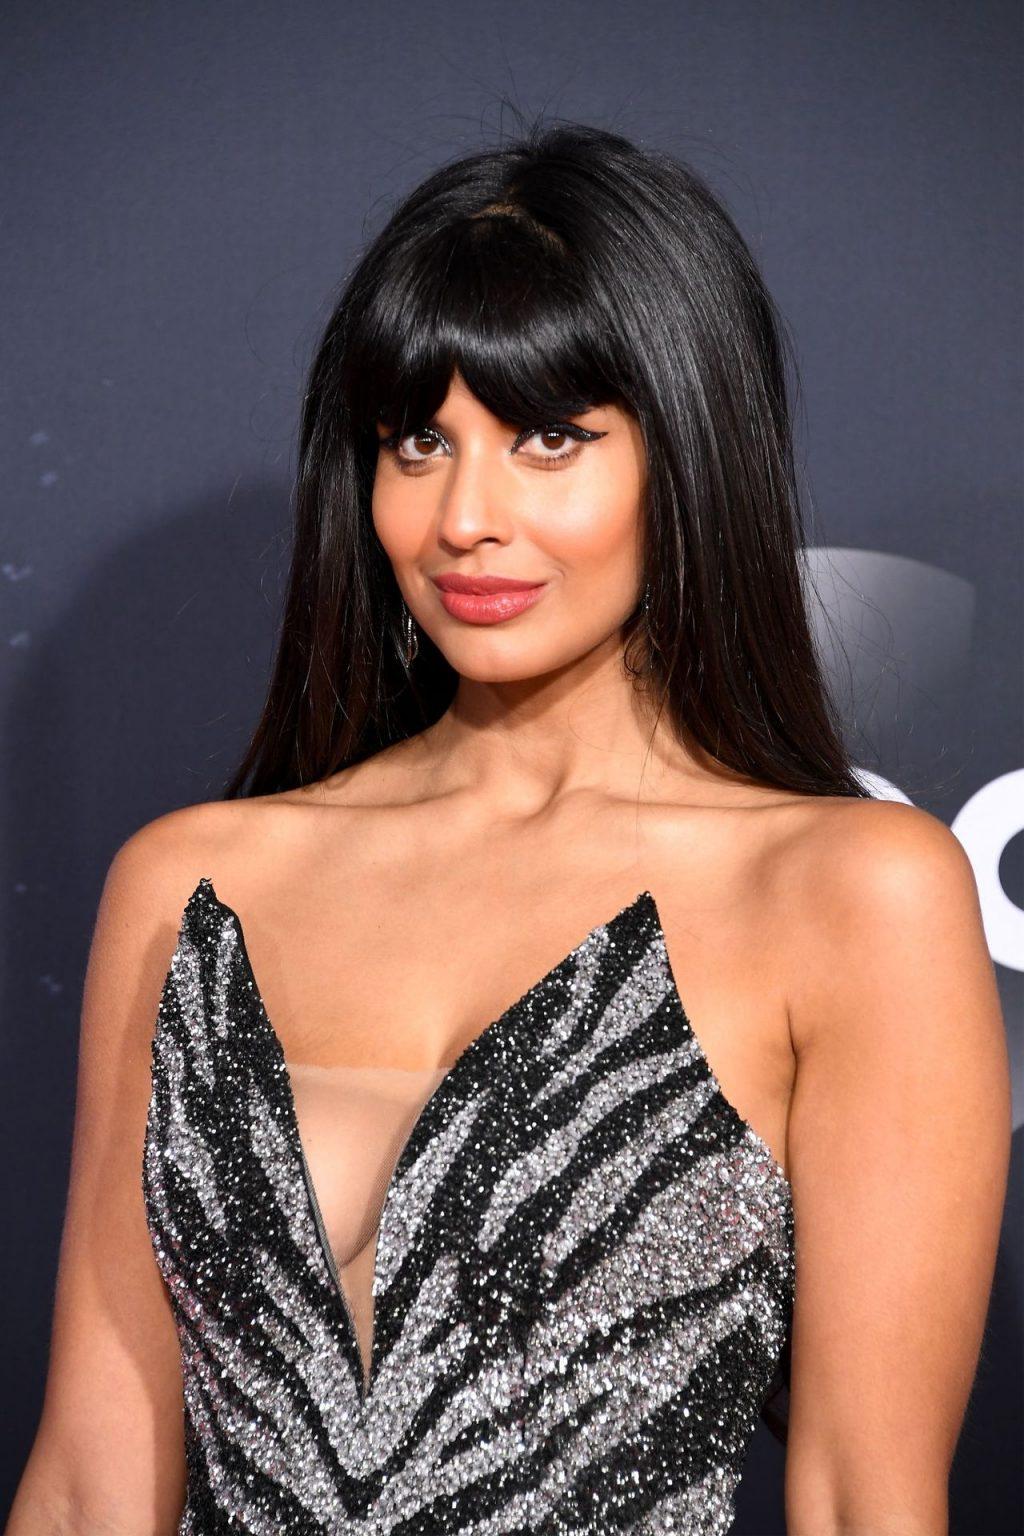 Jameela Jamil Sexy (51 Photos)